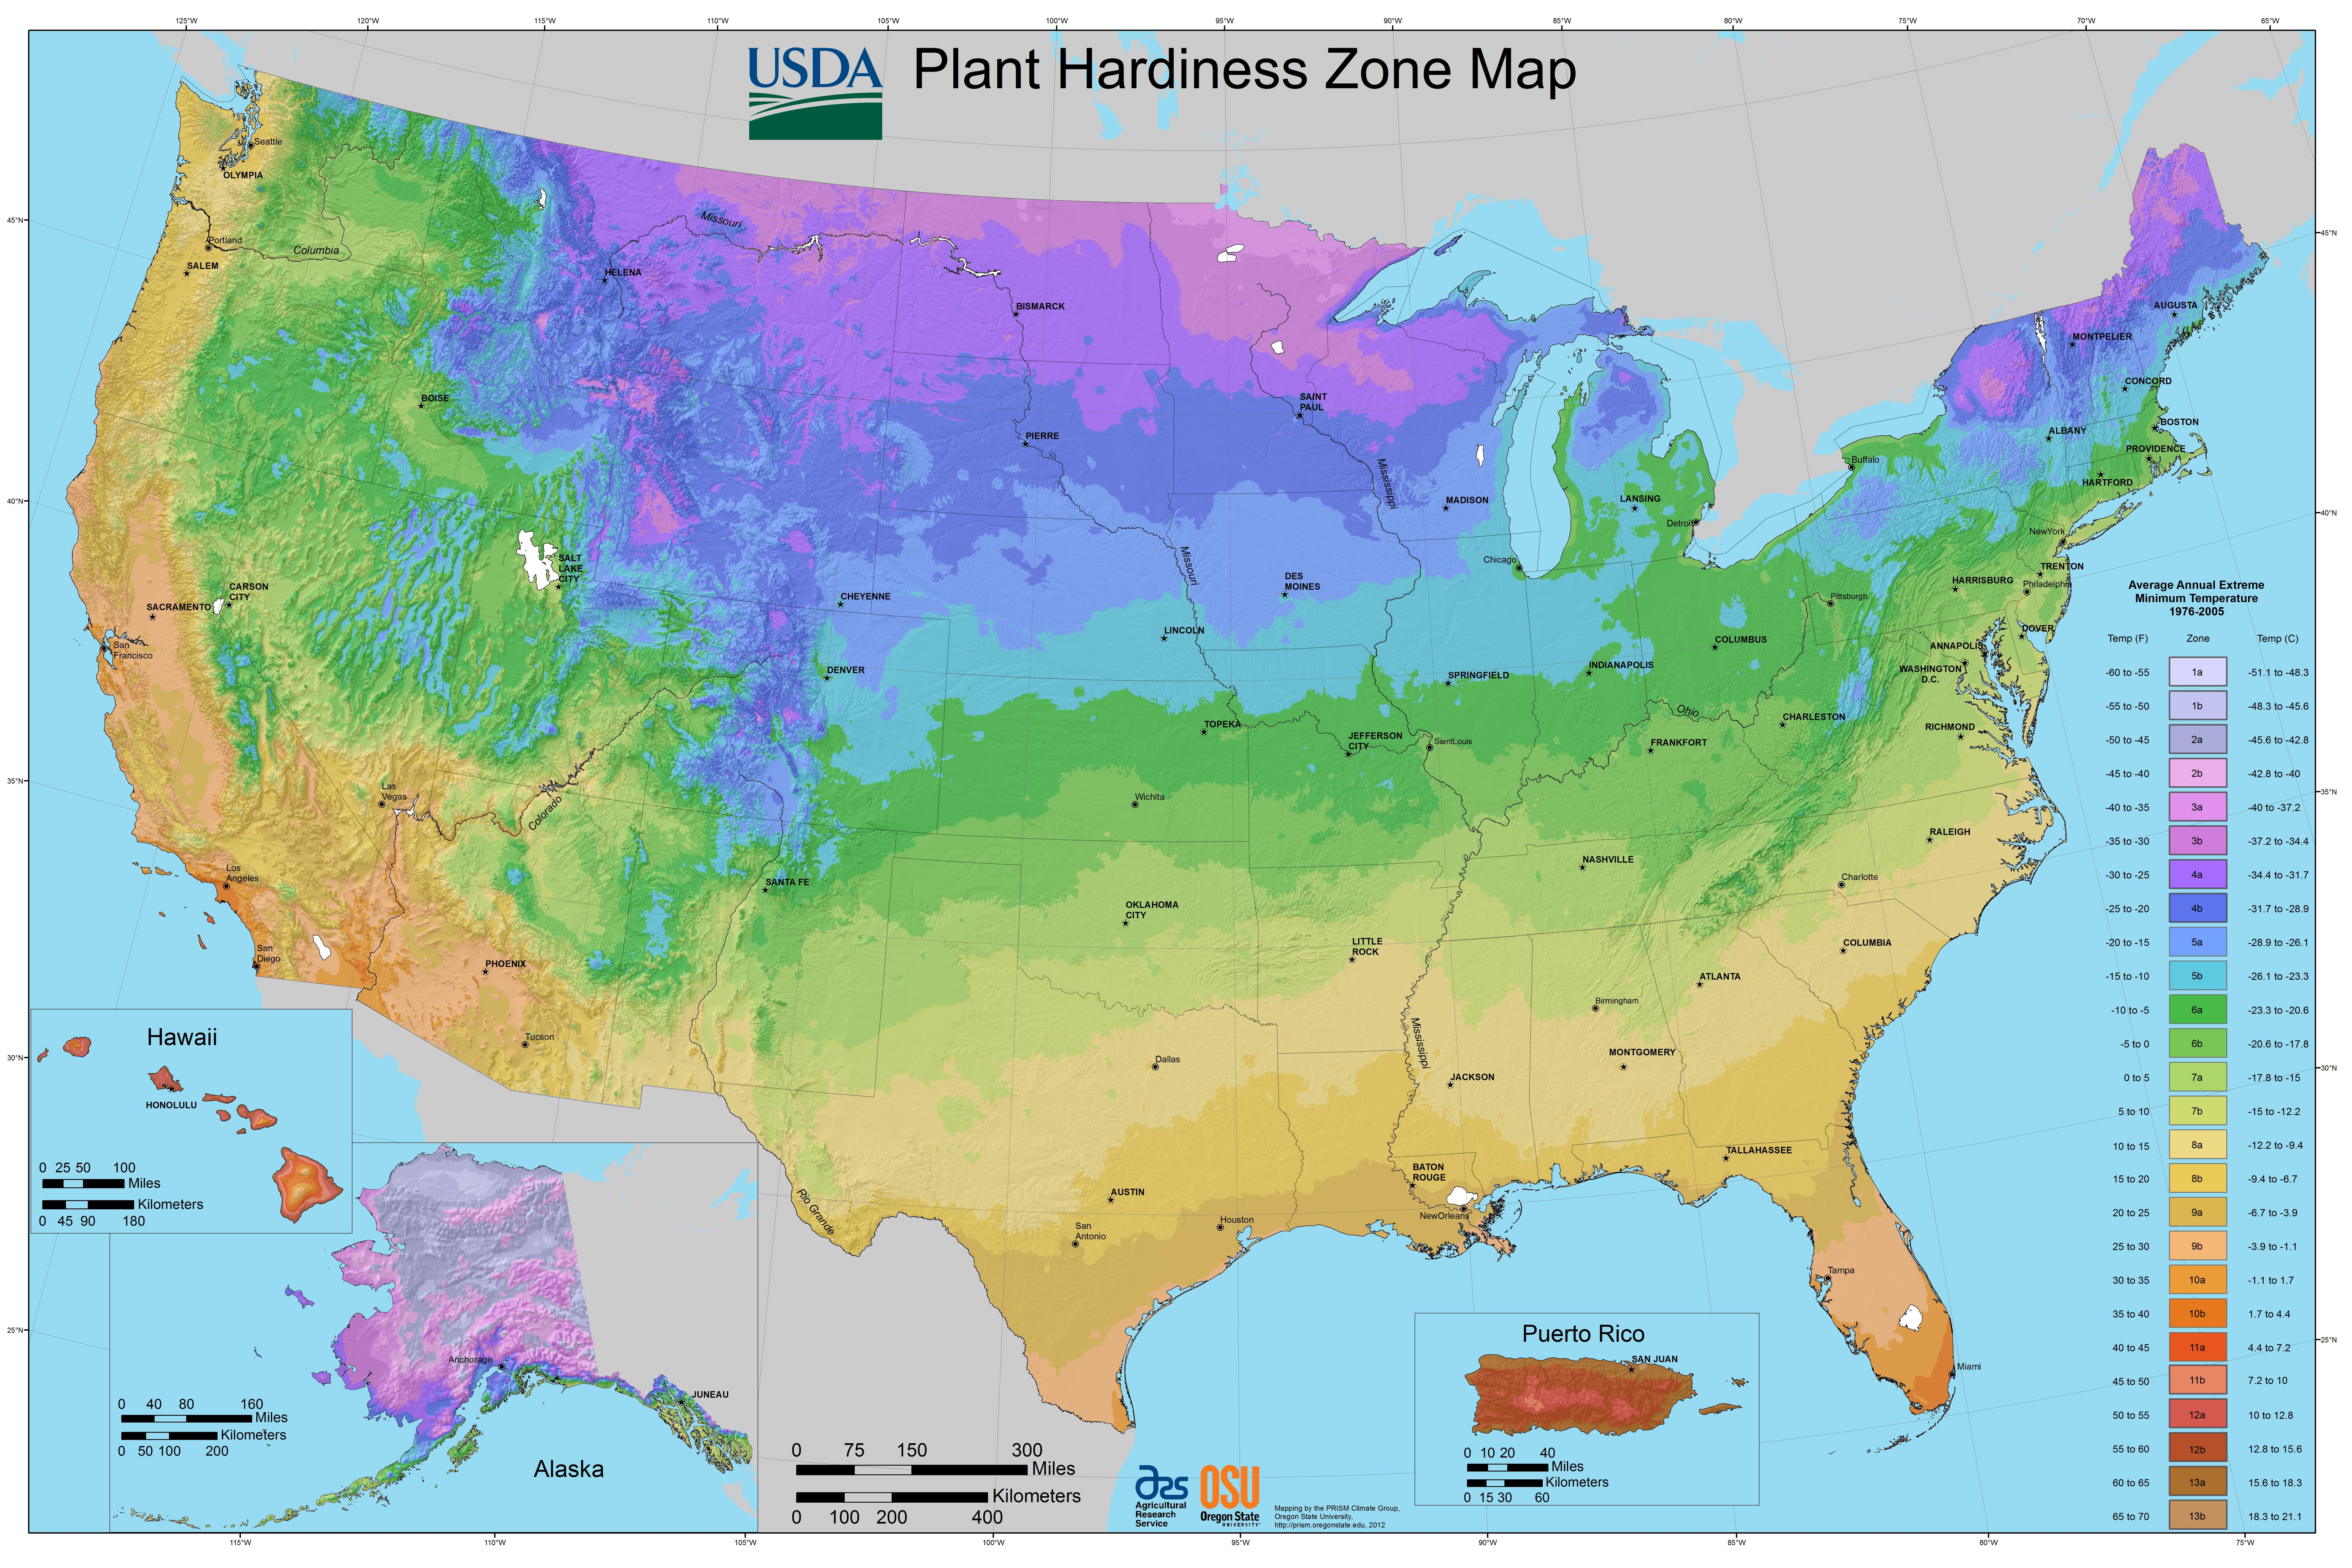 Map Downloads | Usda Plant Hardiness Zone Map - Usda Hardiness Zone Map California